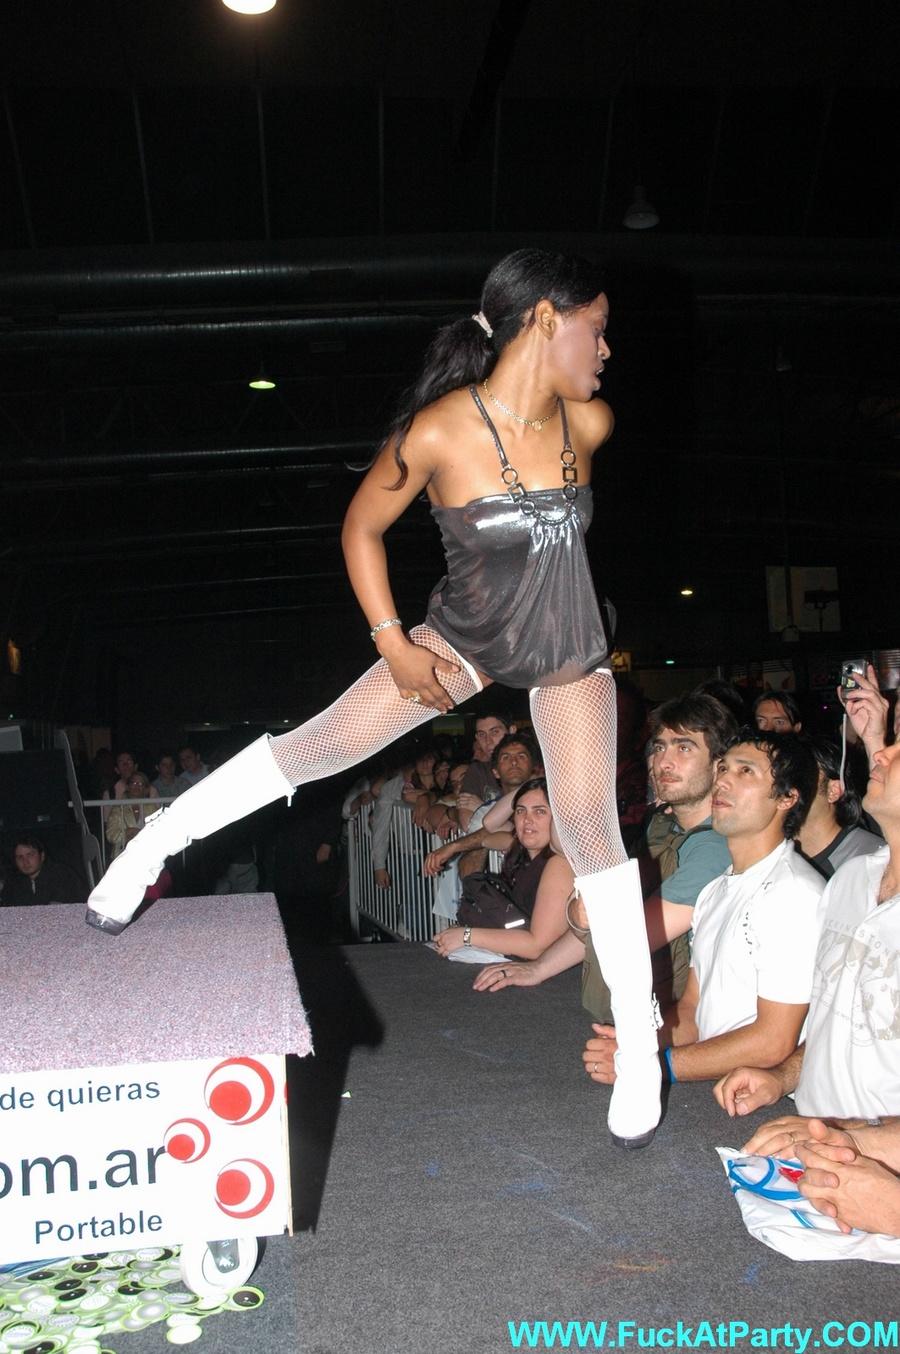 Ebony stripper party